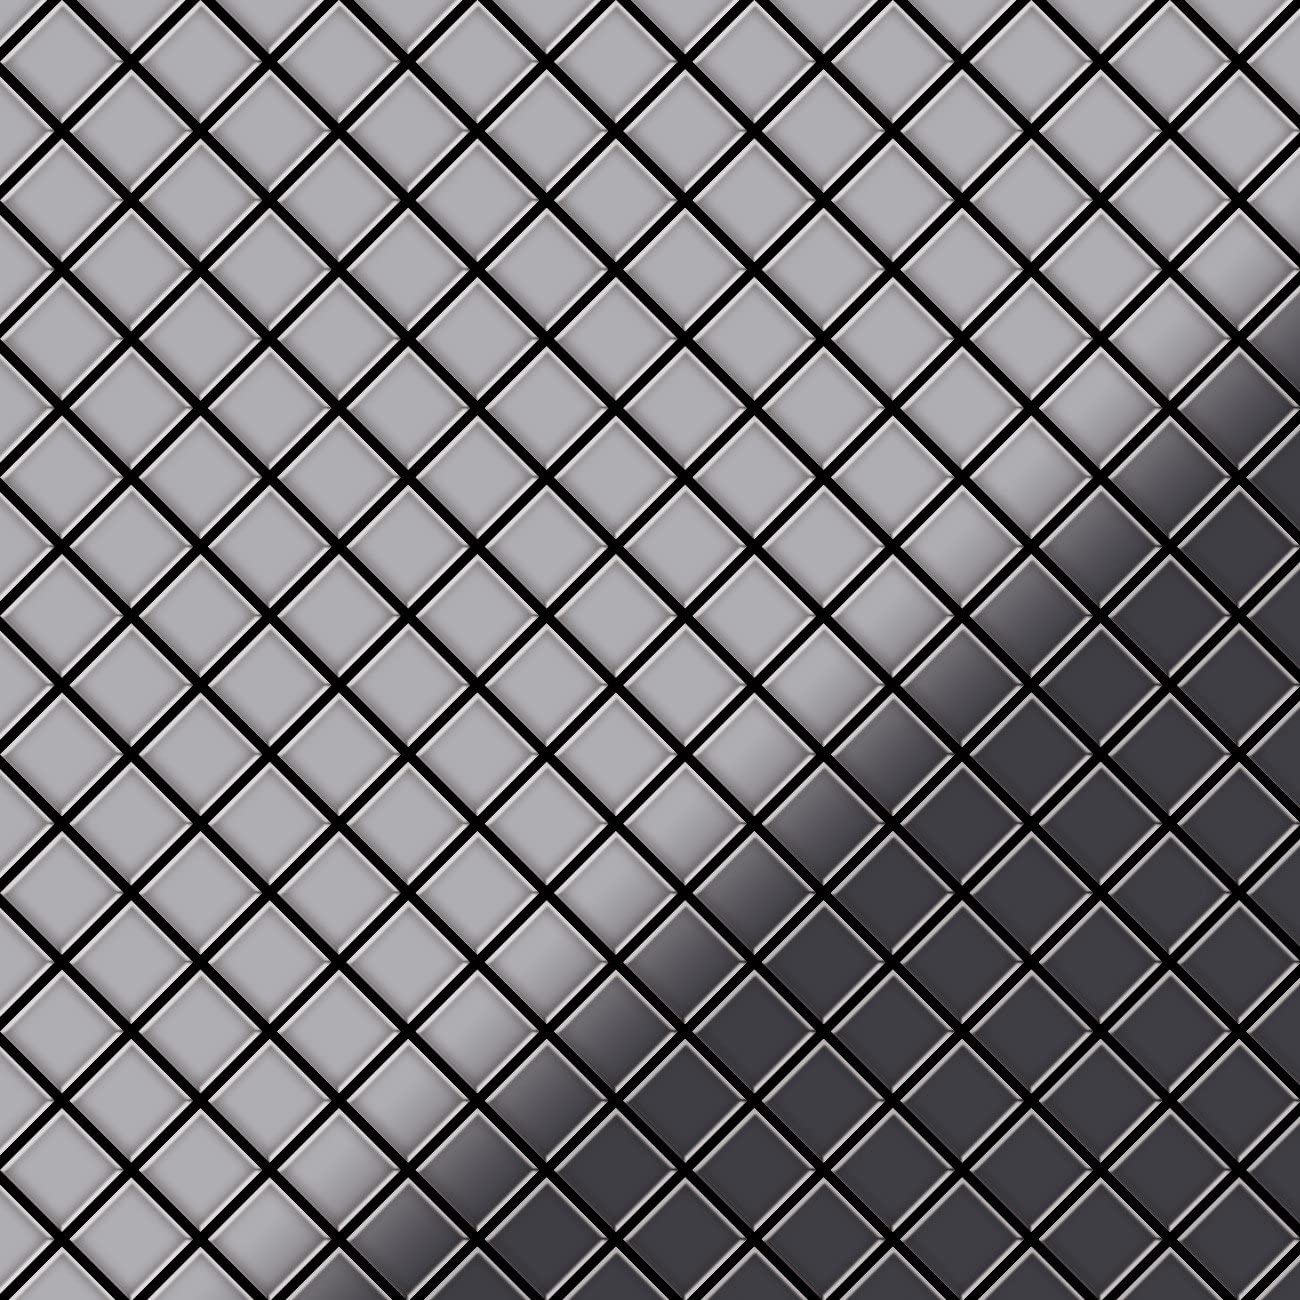 Mosaic Tile massiv Metal Stainless Steel Marine Mirror Grey 1.6mm Thick ALLOY Diamond-S-S-MM